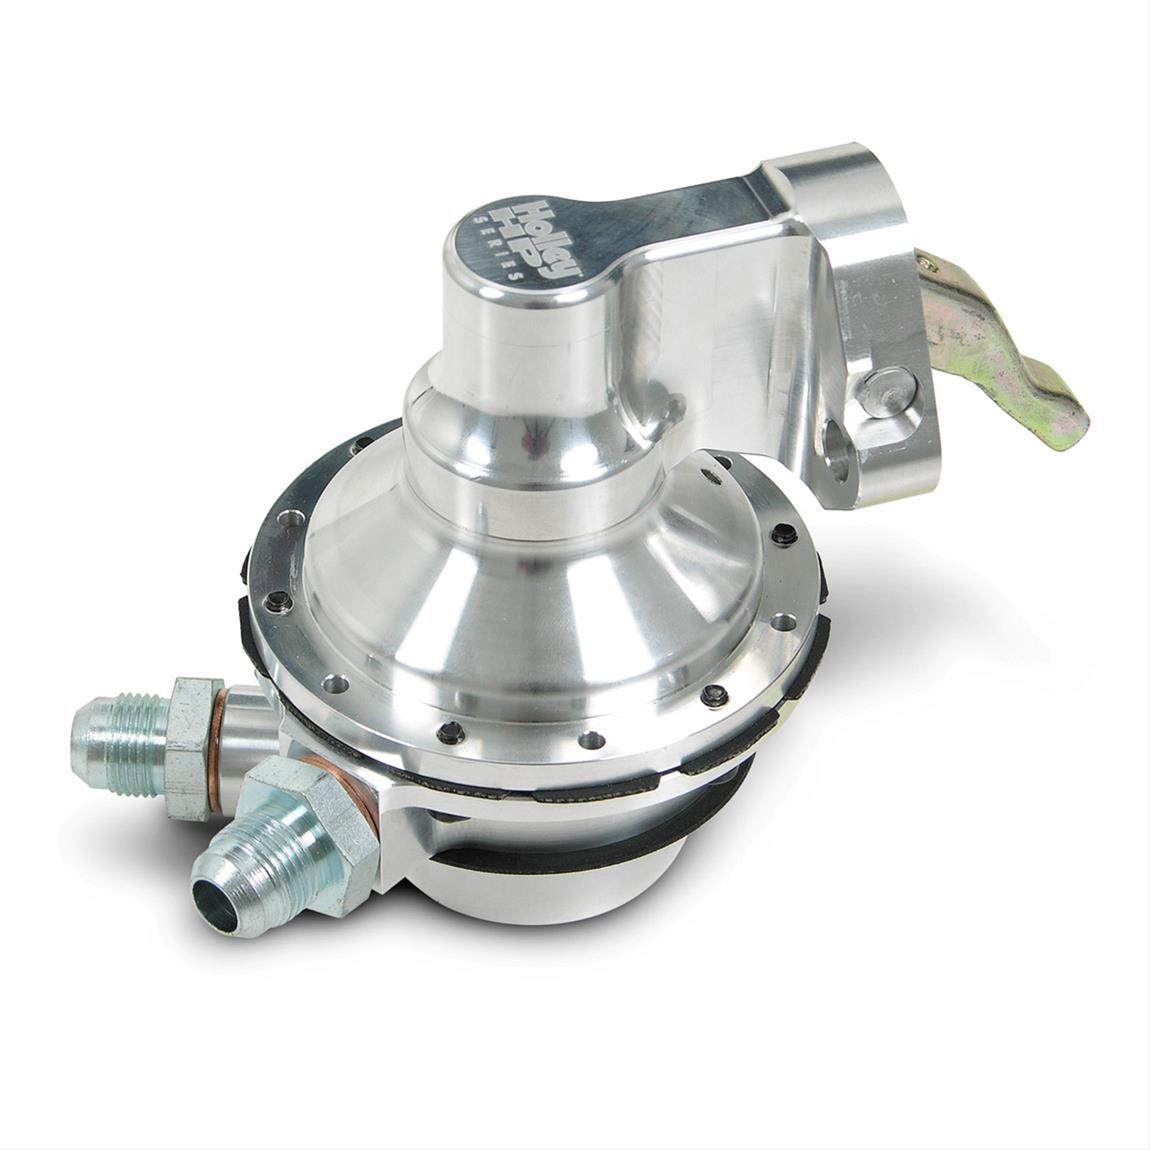 Holley Ultra HP Billet Mechanical Fuel Pumps 12-454-25